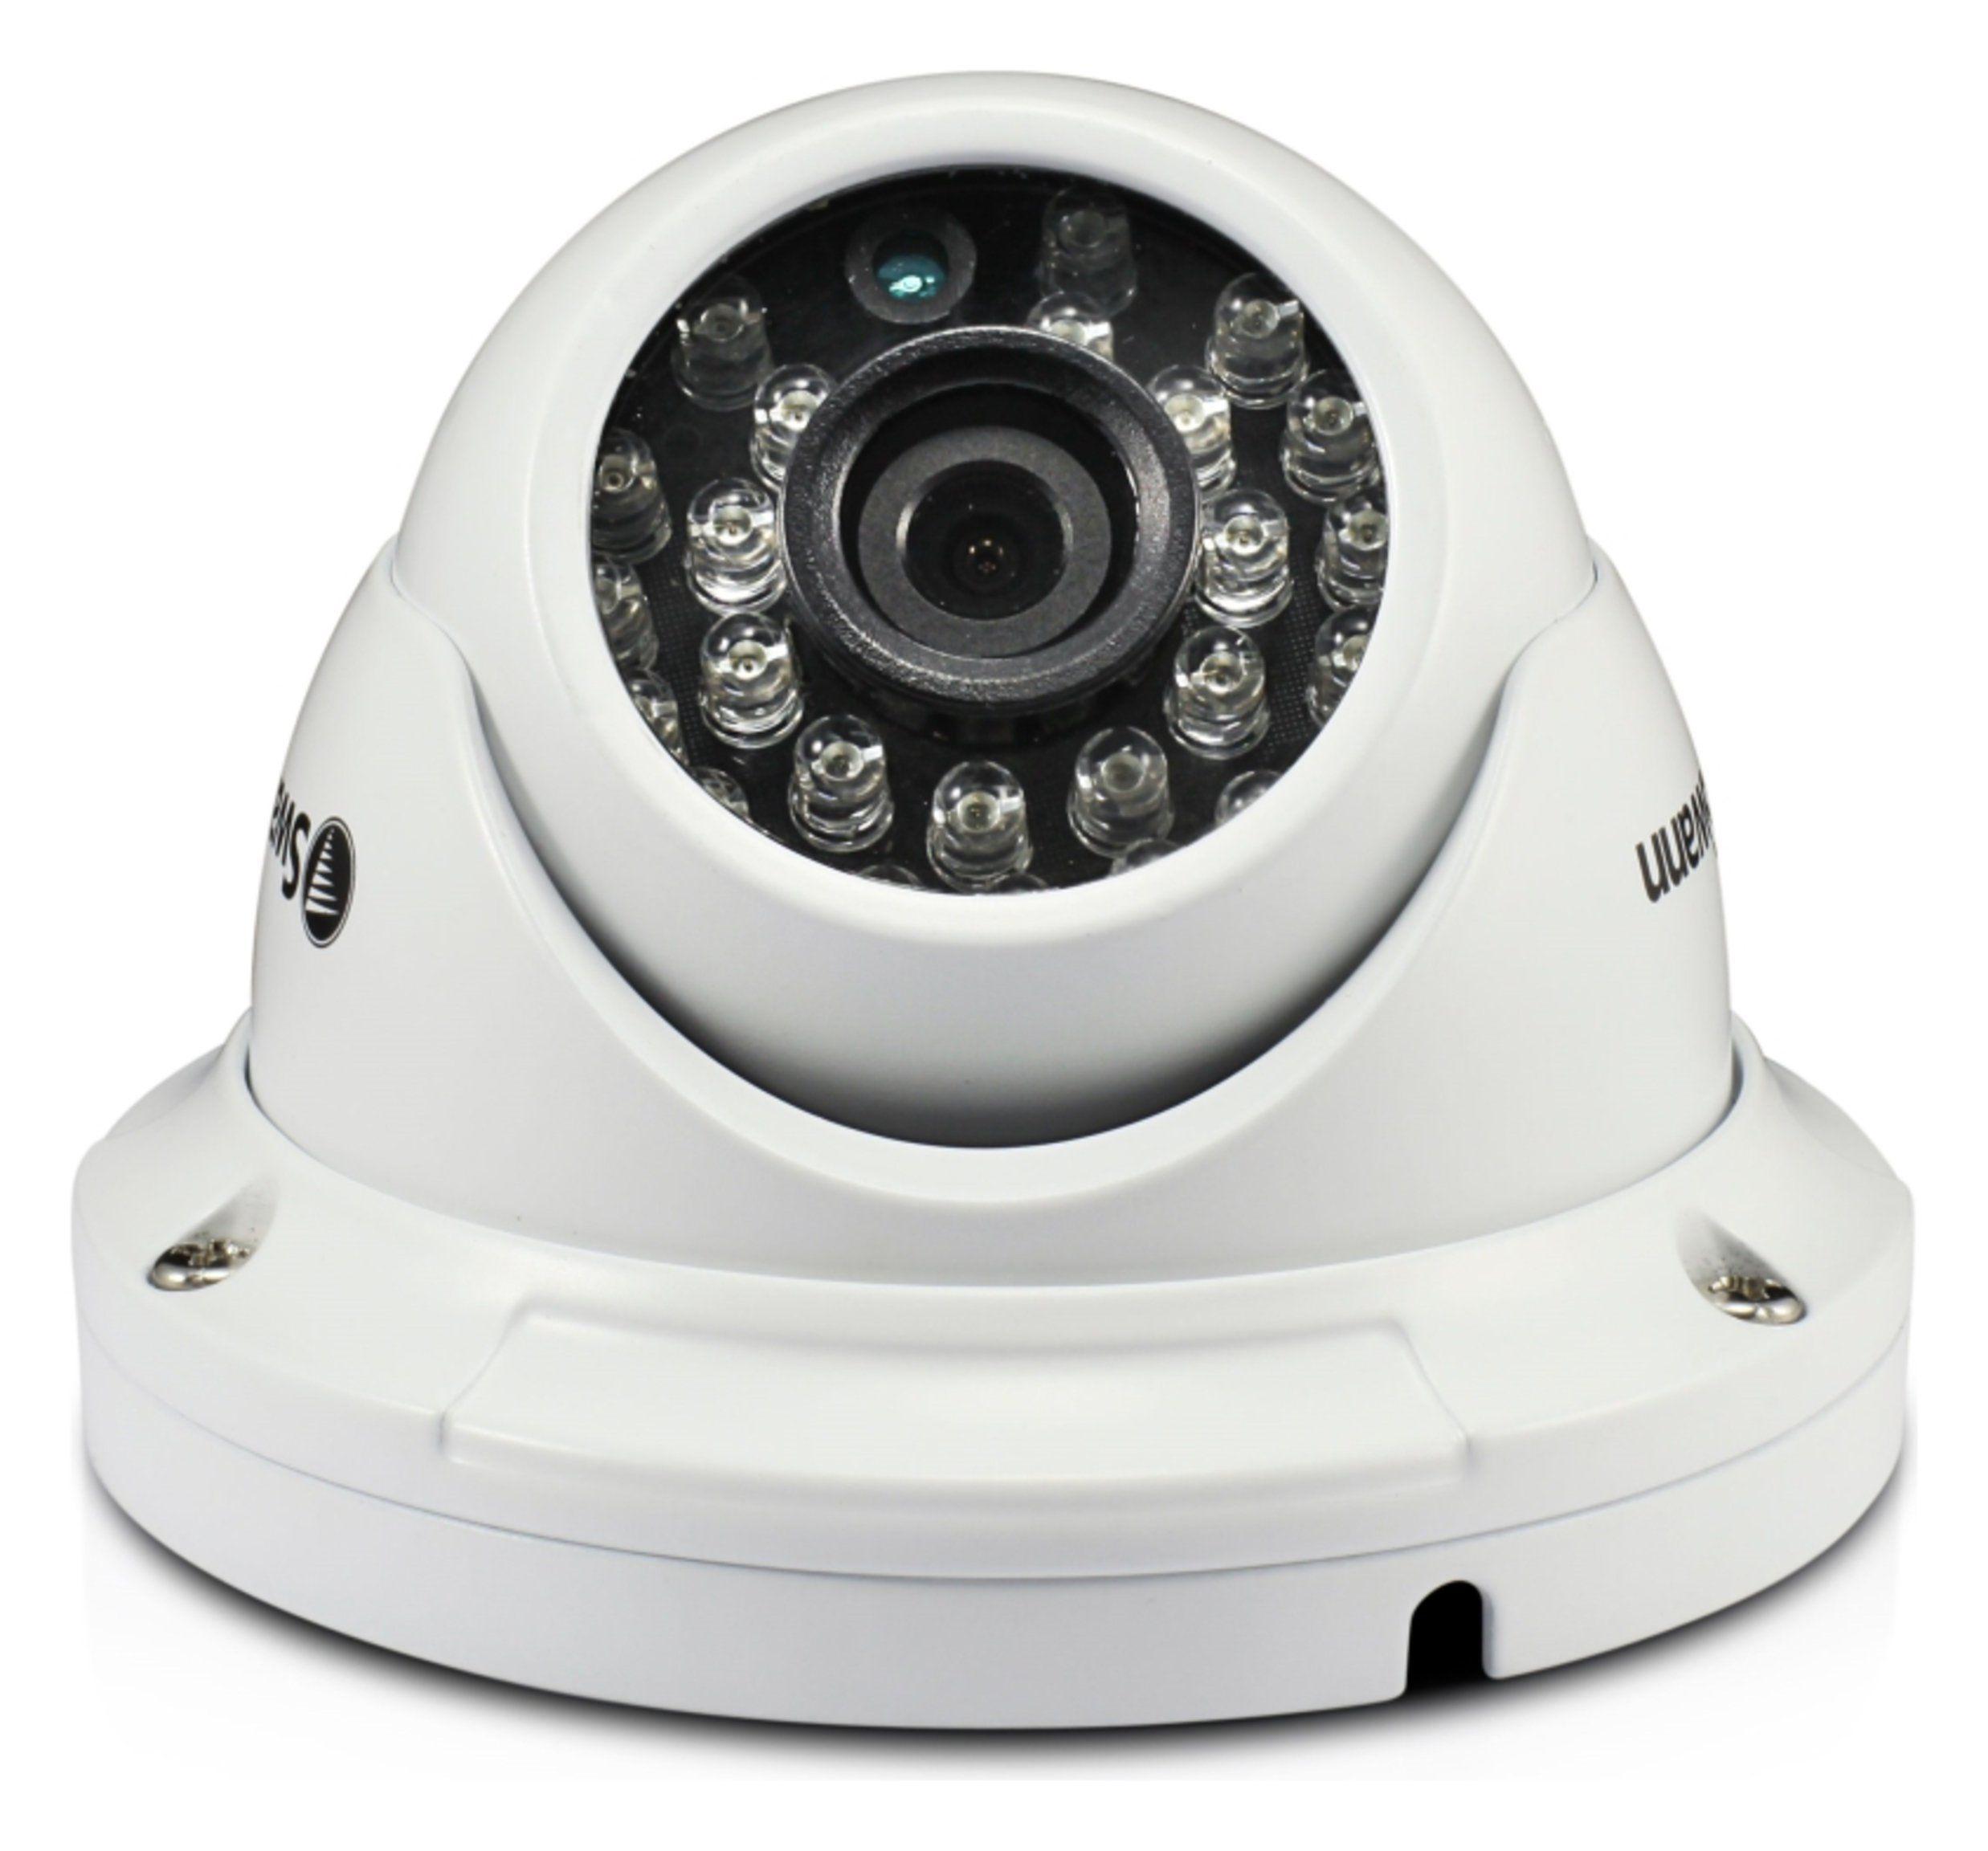 Best Budget Camera For Travelling Best Cameras Bags 3654076091 Bestcameradslr Dome Camera Outdoor Security Camera Best Camera